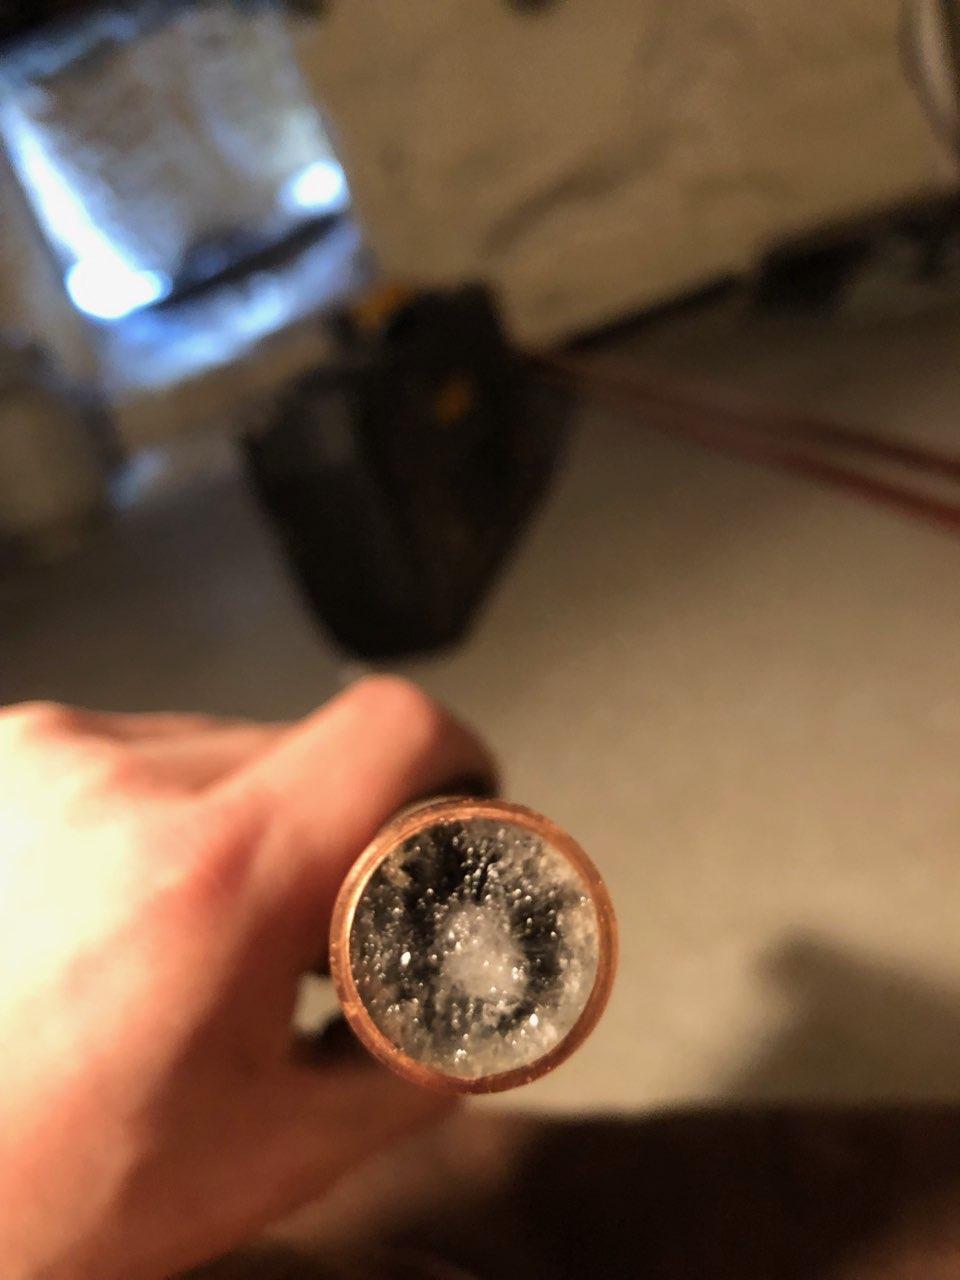 inside of a frozen pipe during 2019 Chicago polar vortex